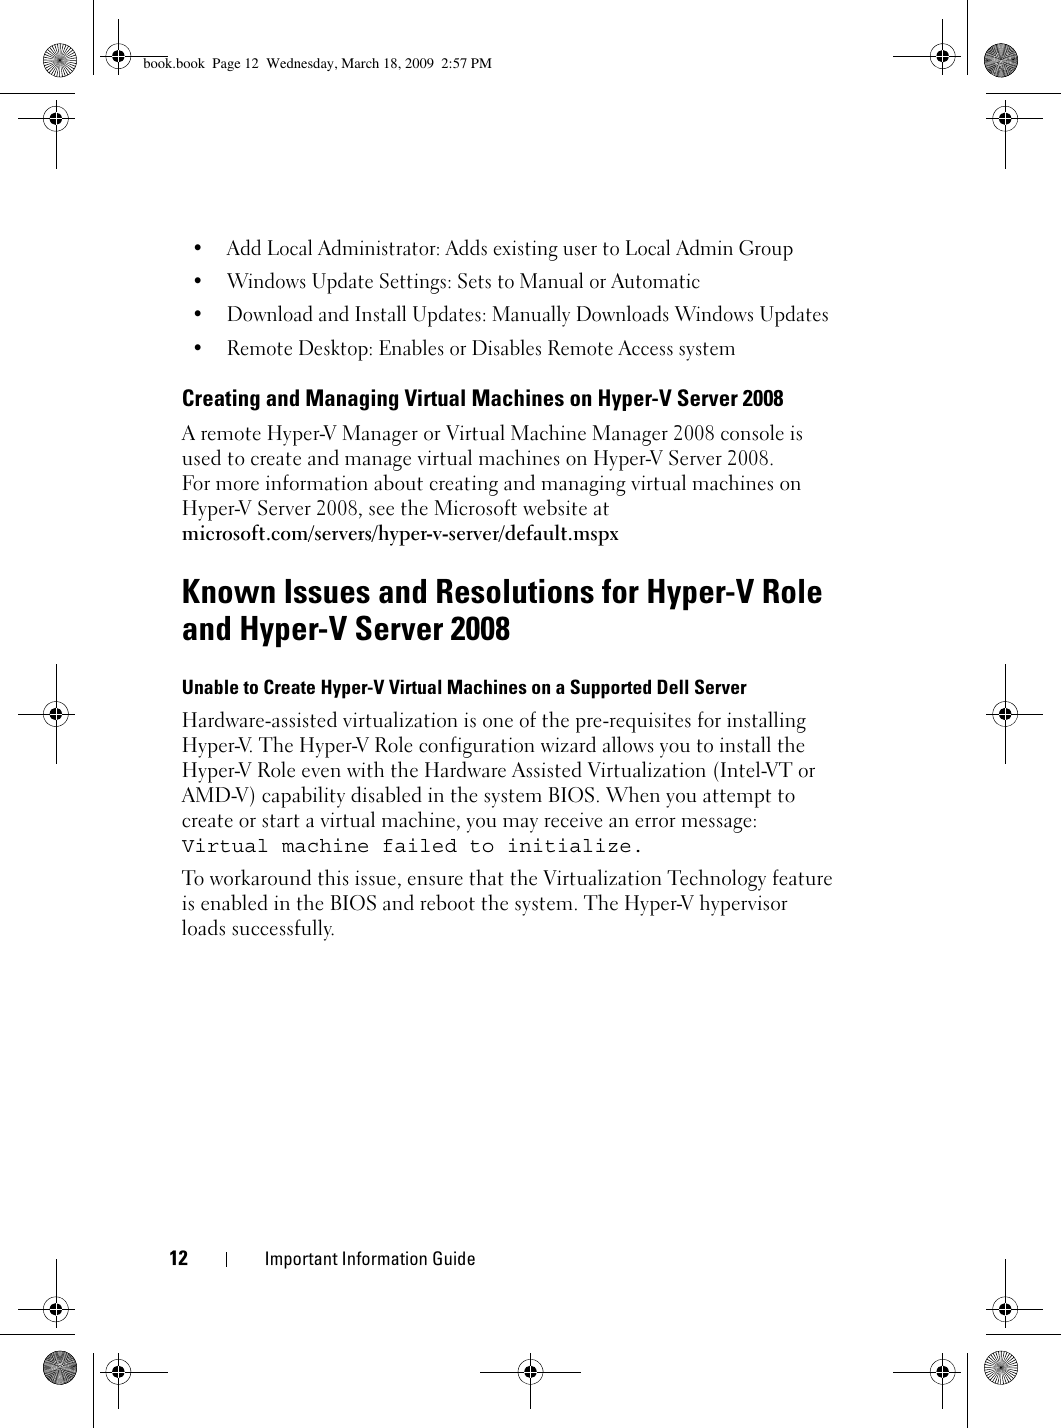 Dell Micrsoft Hyper V Server 2008 Important Information Guide V™